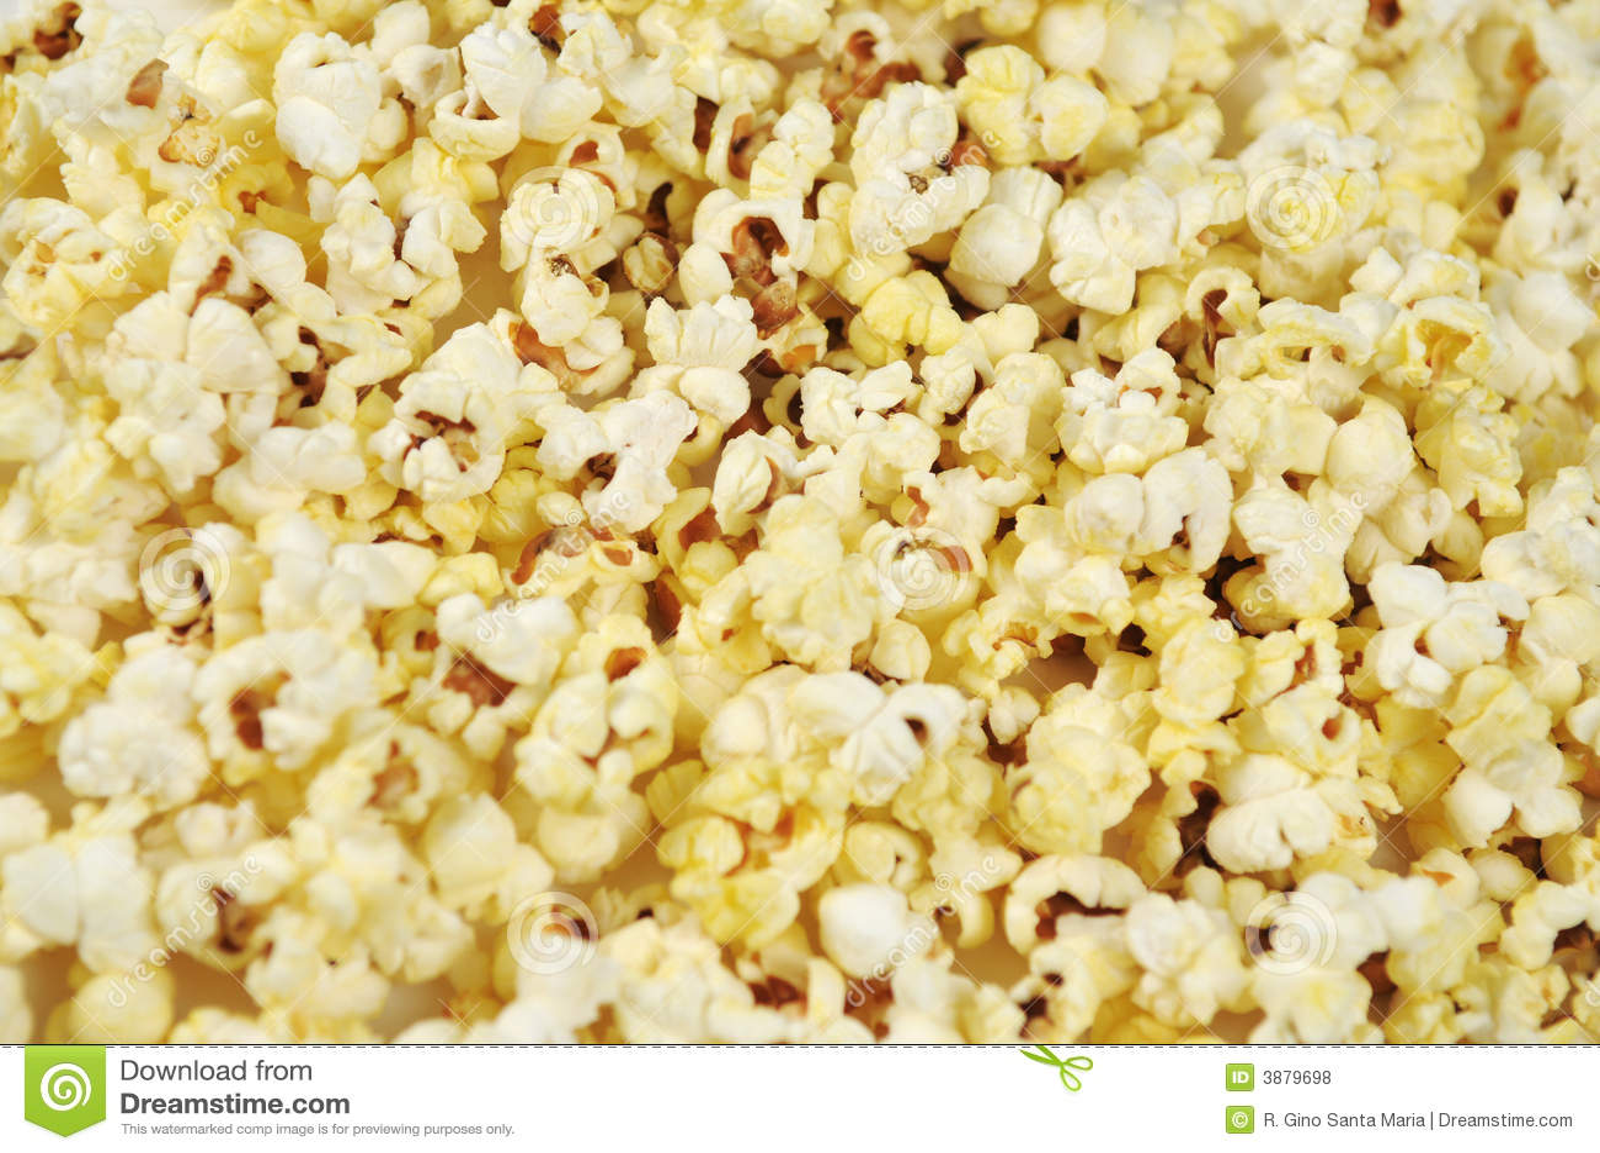 Buttered Popcorn Background